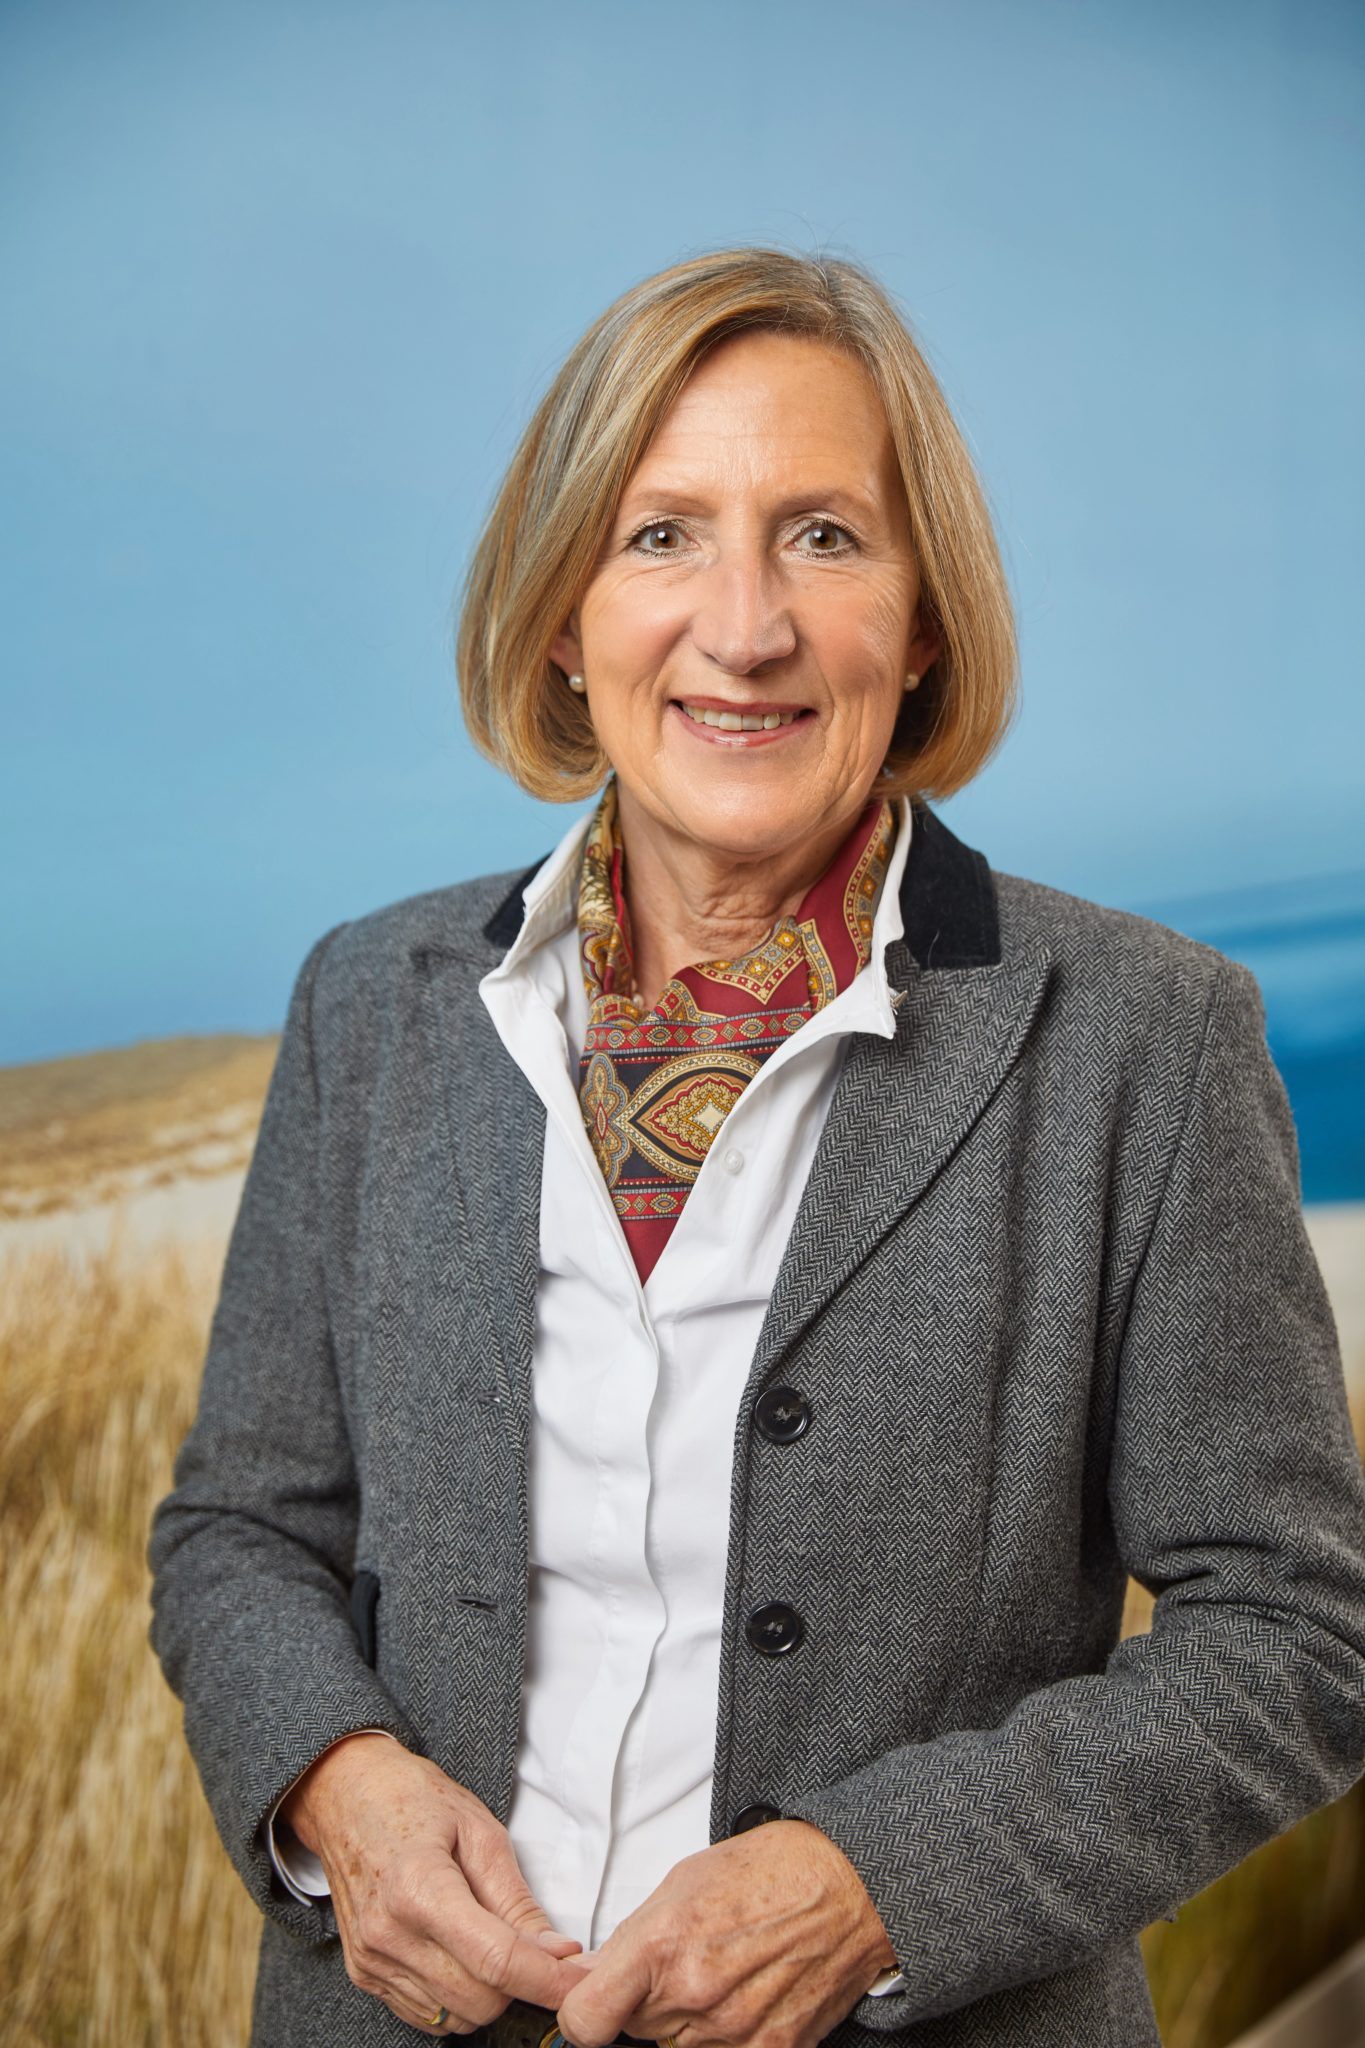 Bärberl Dütemeyer, Vorsitzende